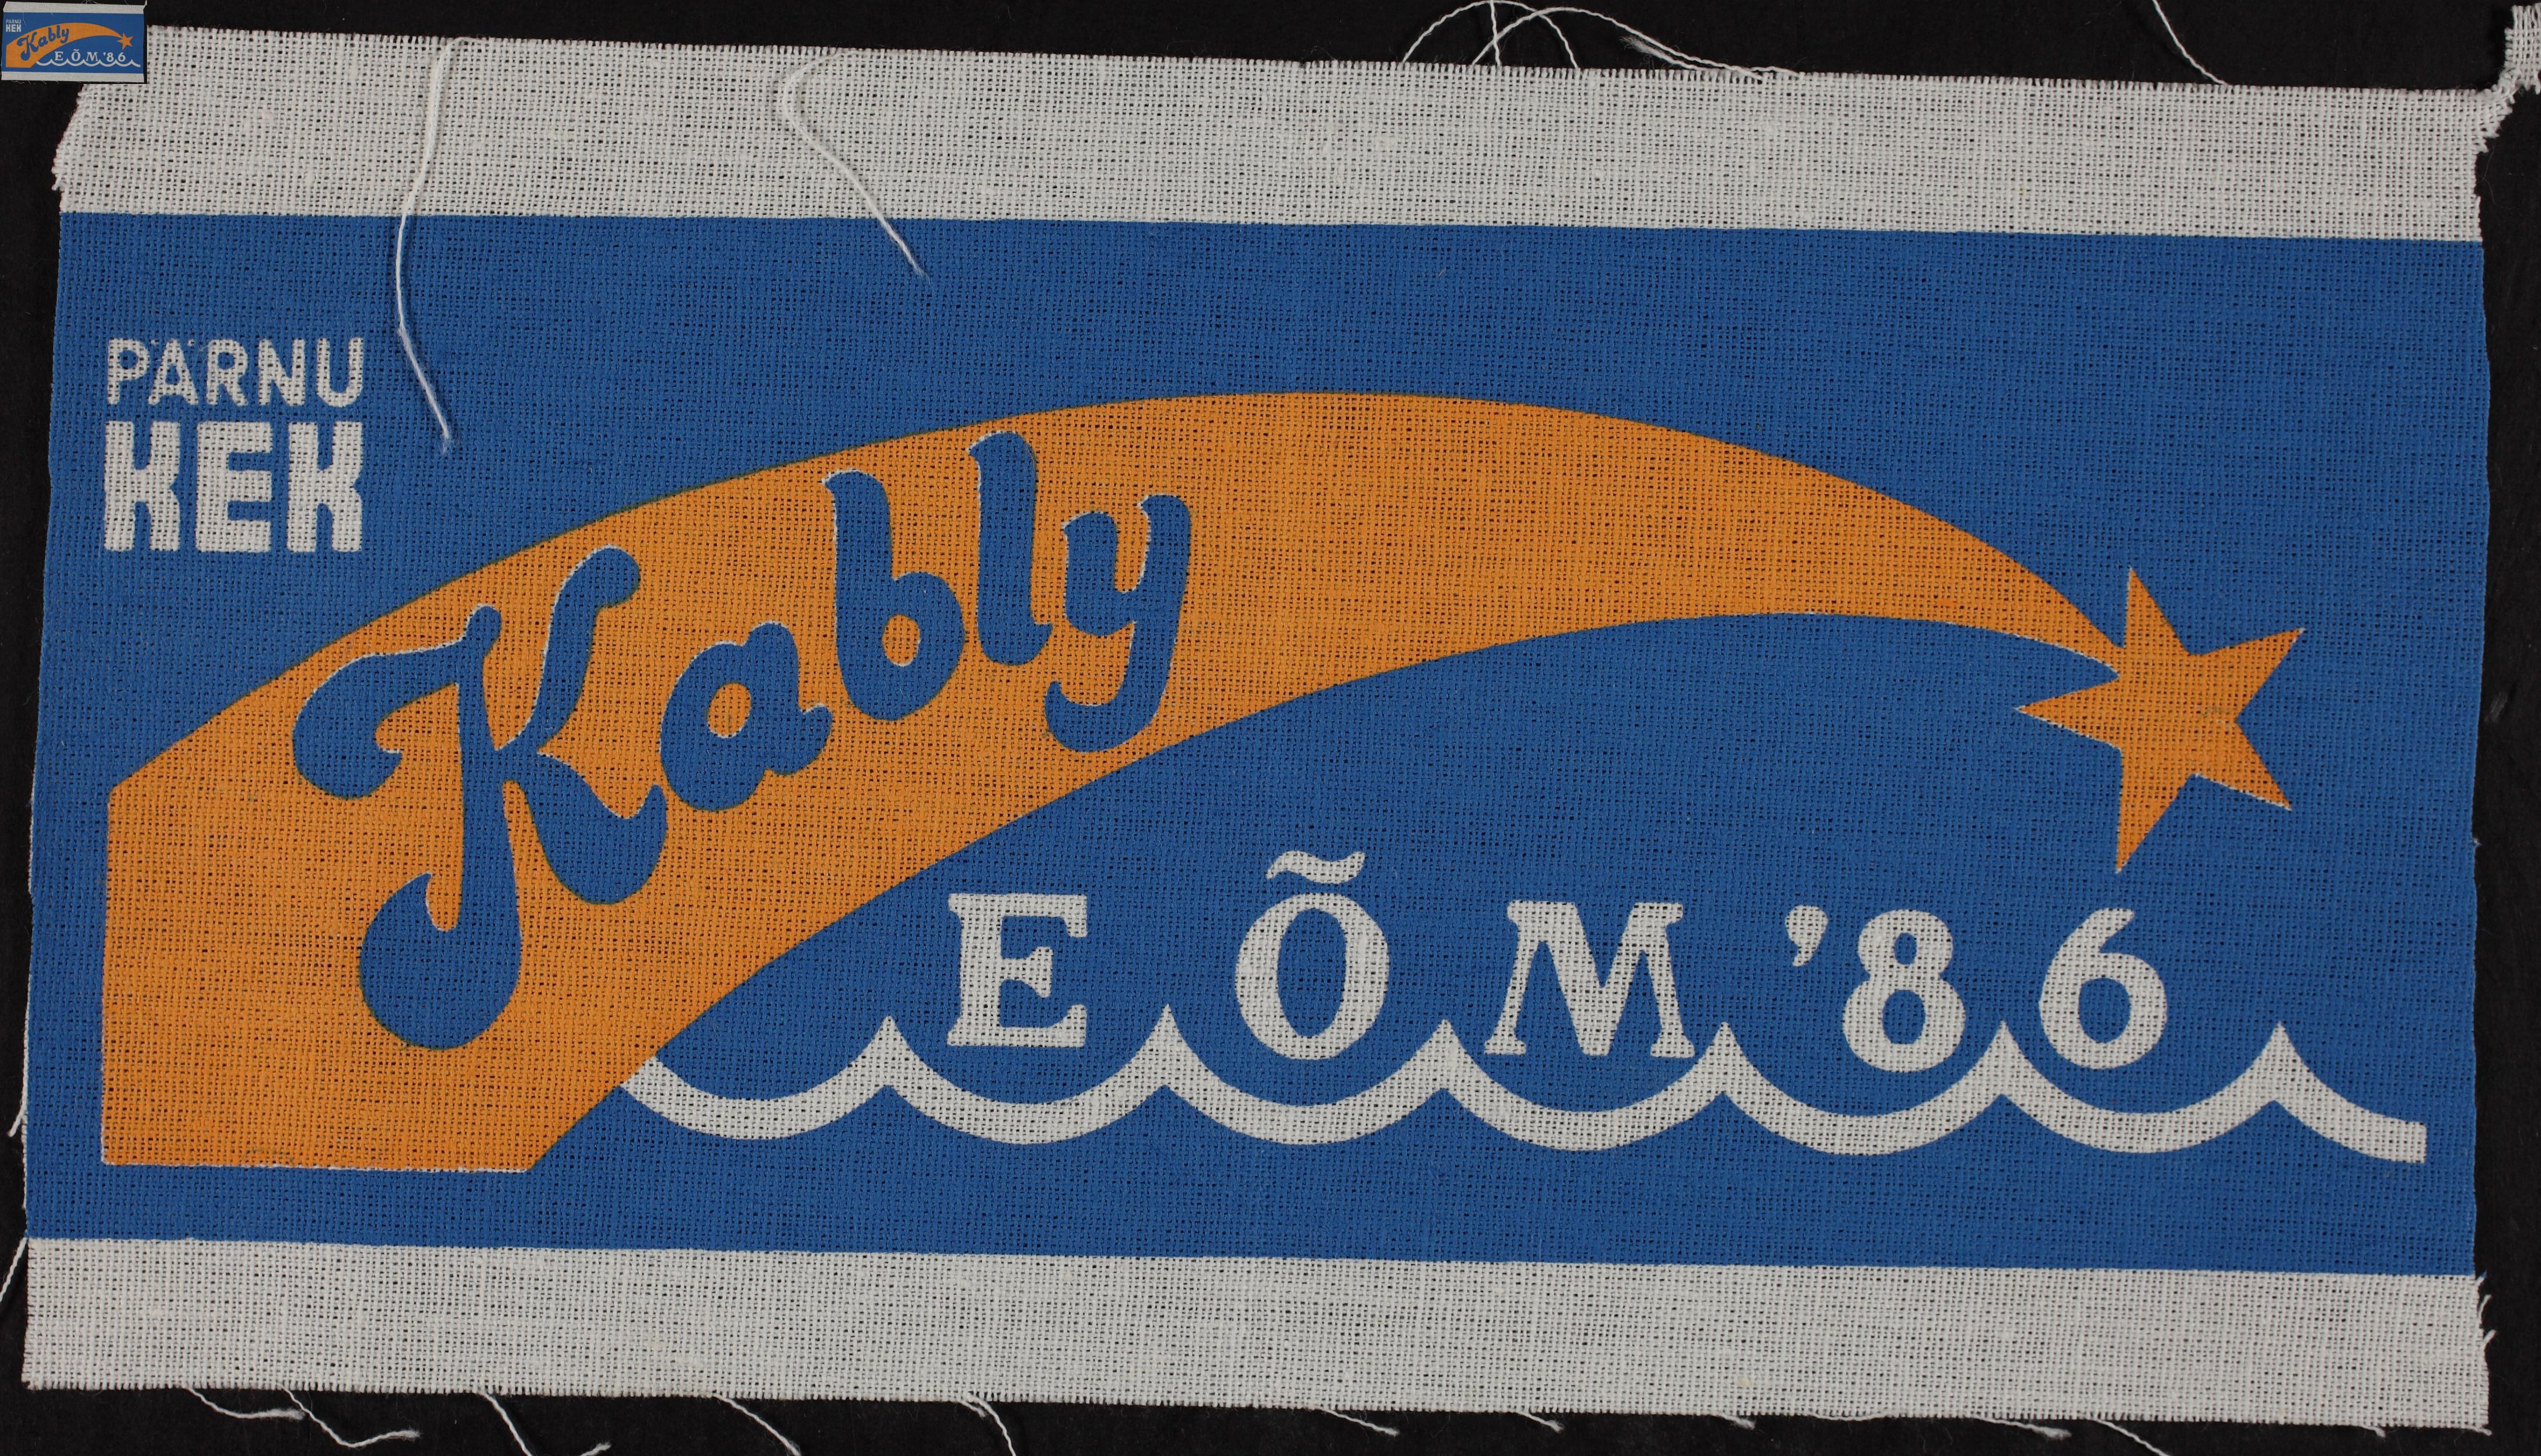 Maleva embleem, Kabli 1986 / Secondary School Students' Building Brigade emblem, Kabli 1986